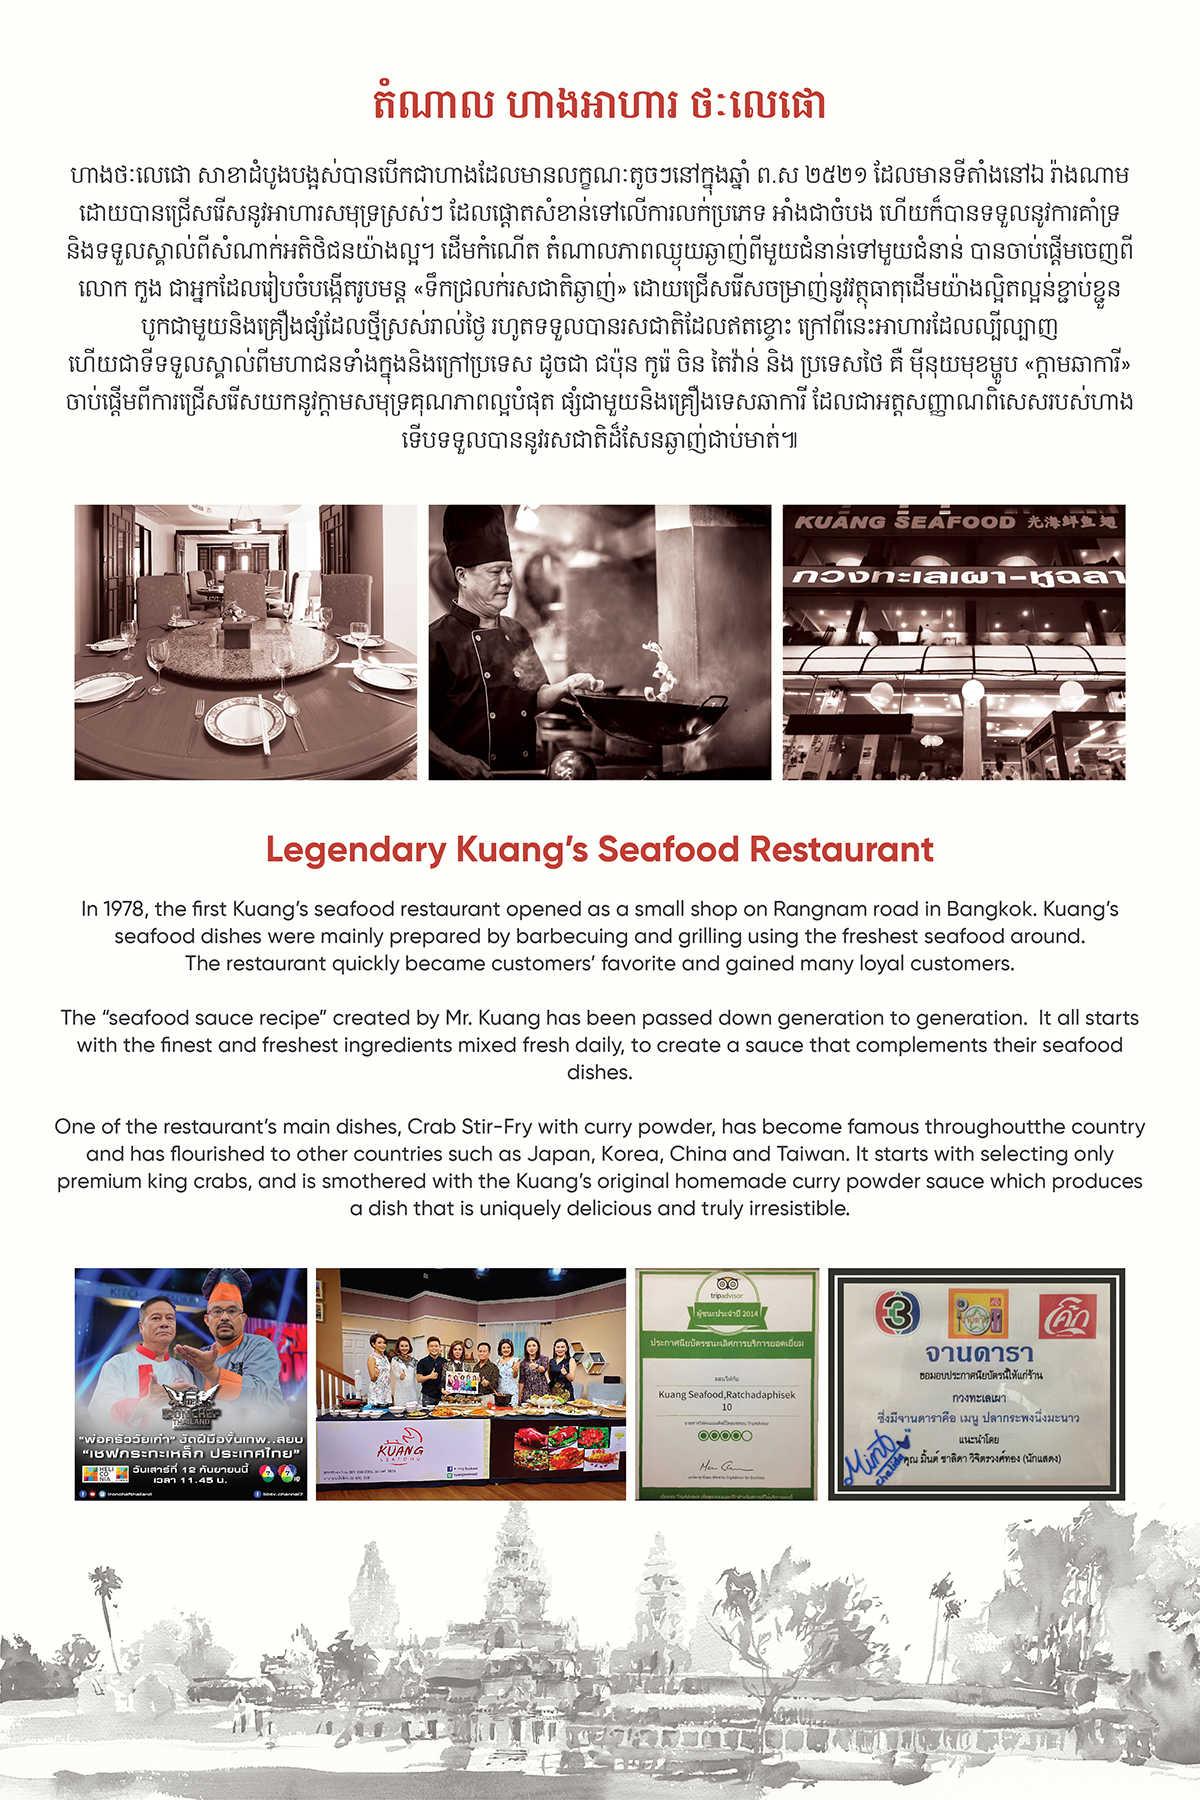 Legendary Kuang Seafood